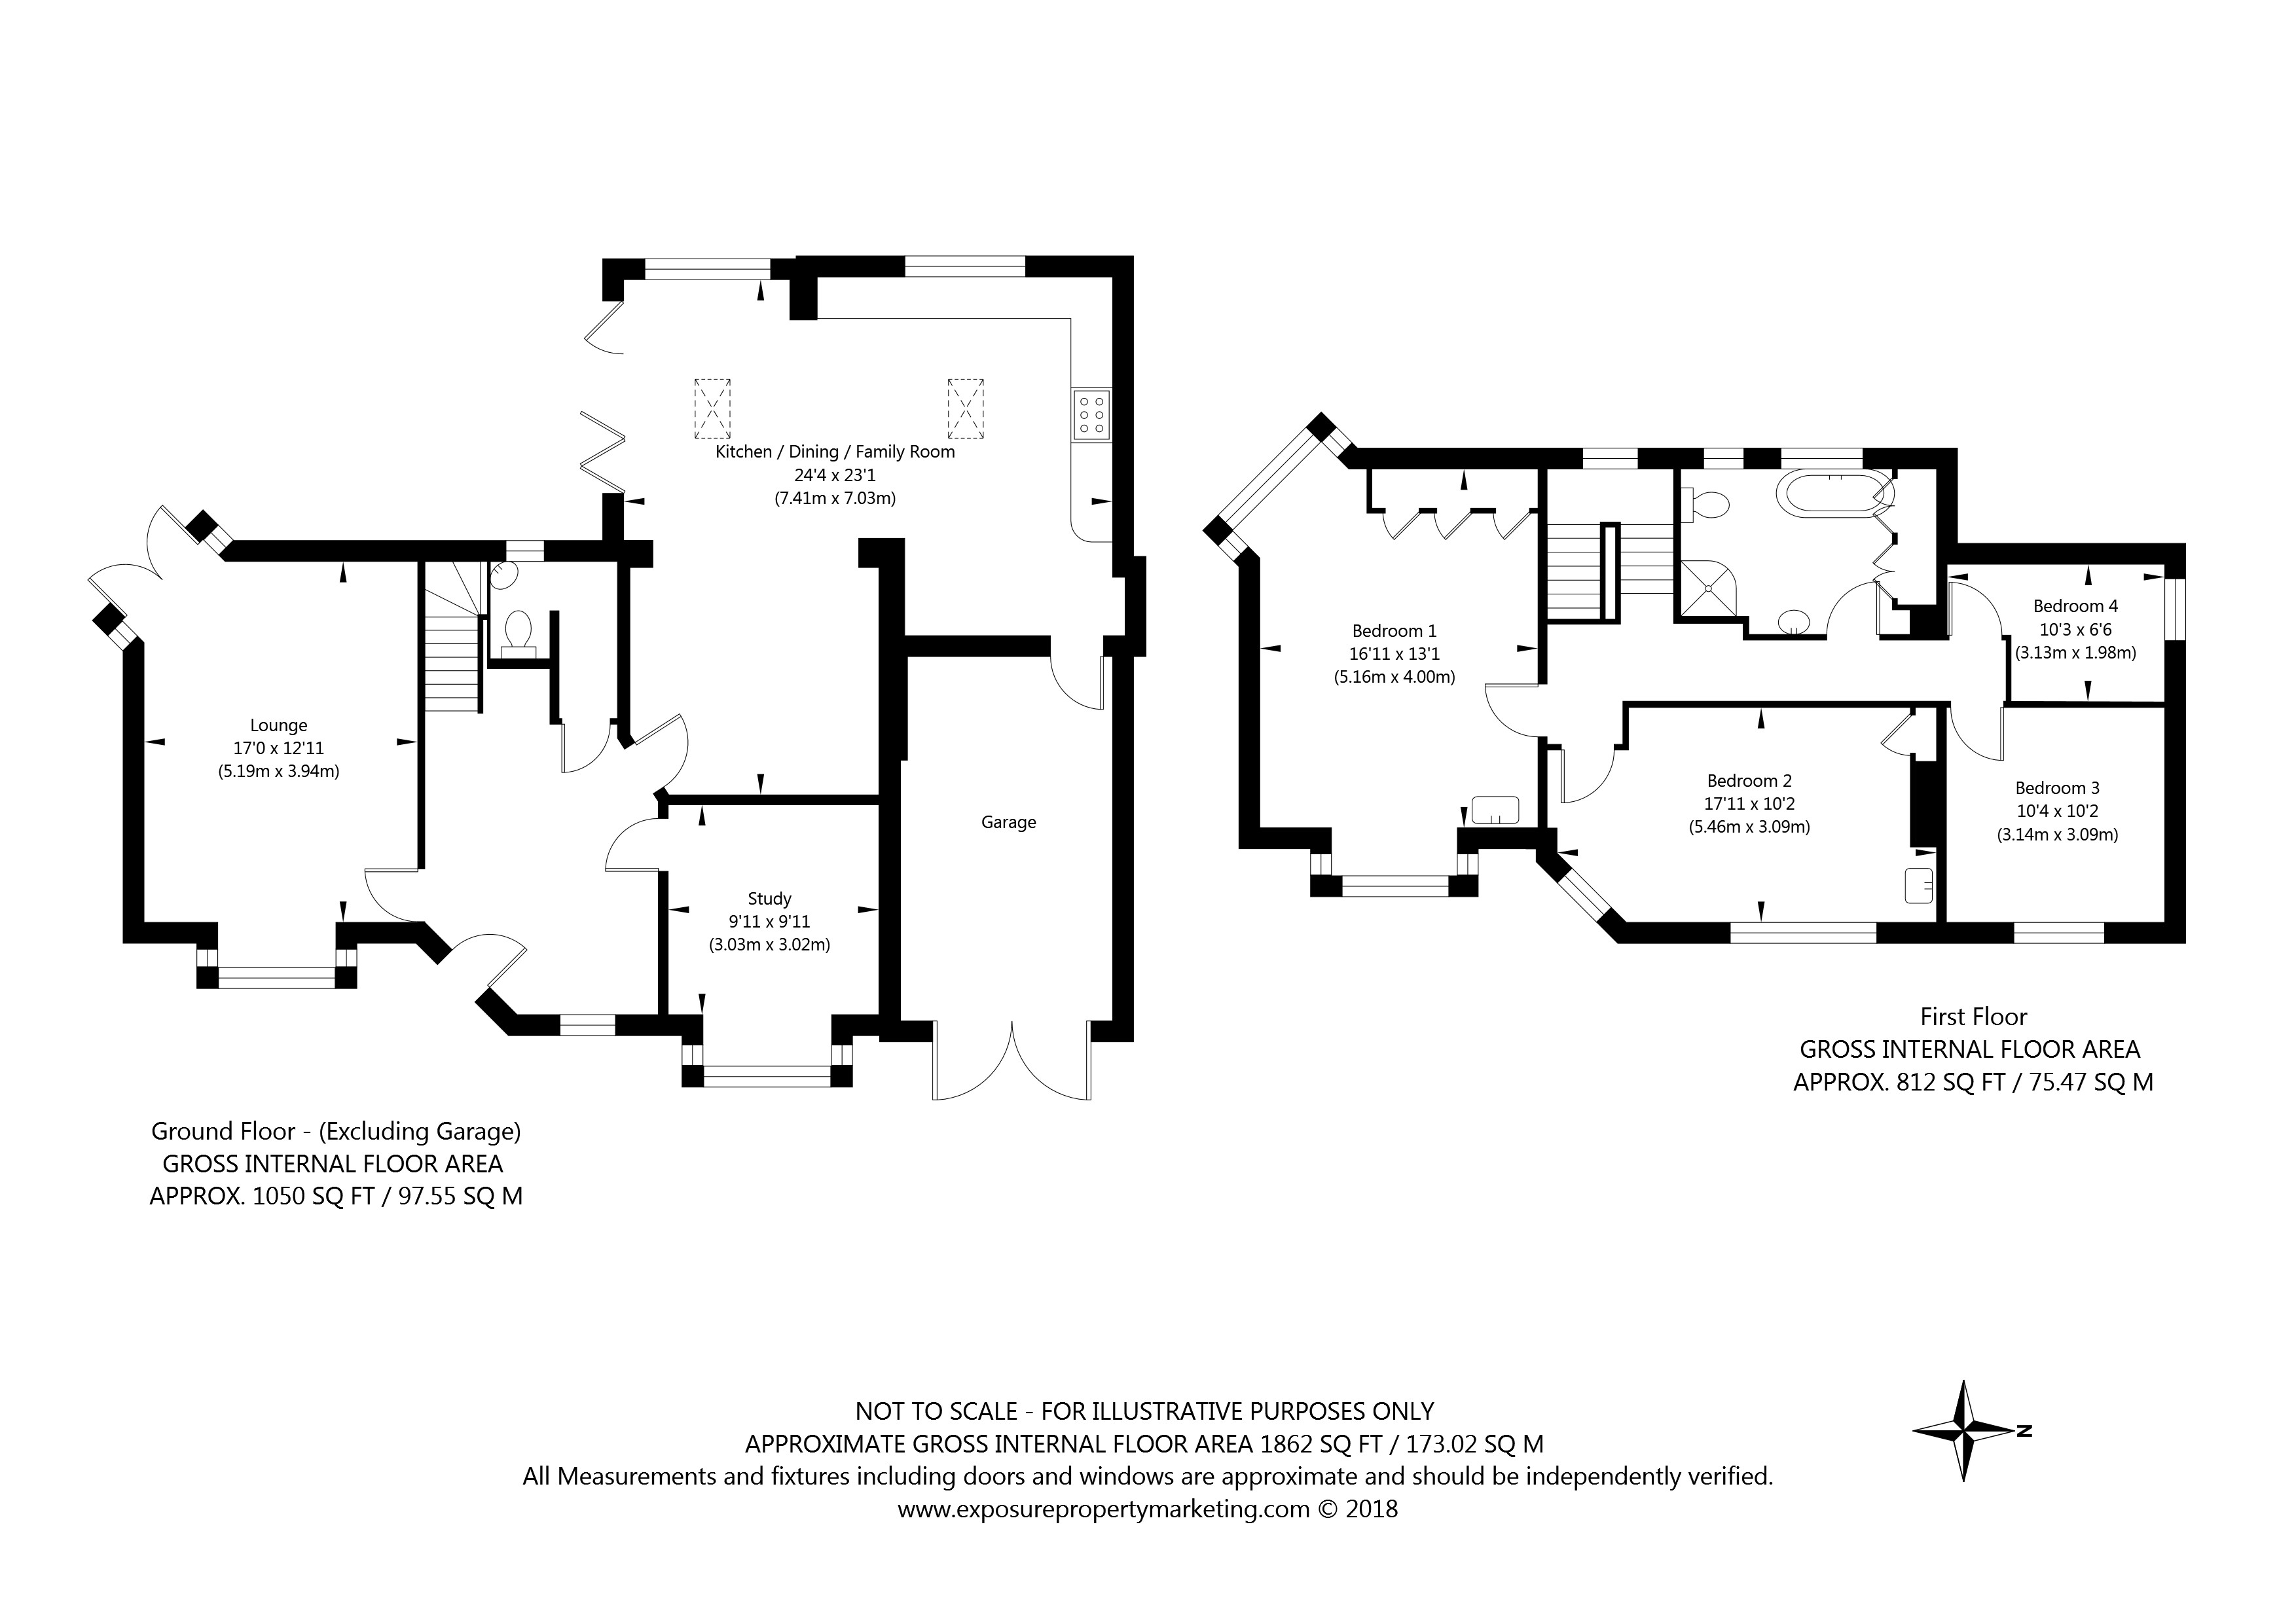 30 The Horseshoe, York property floorplan